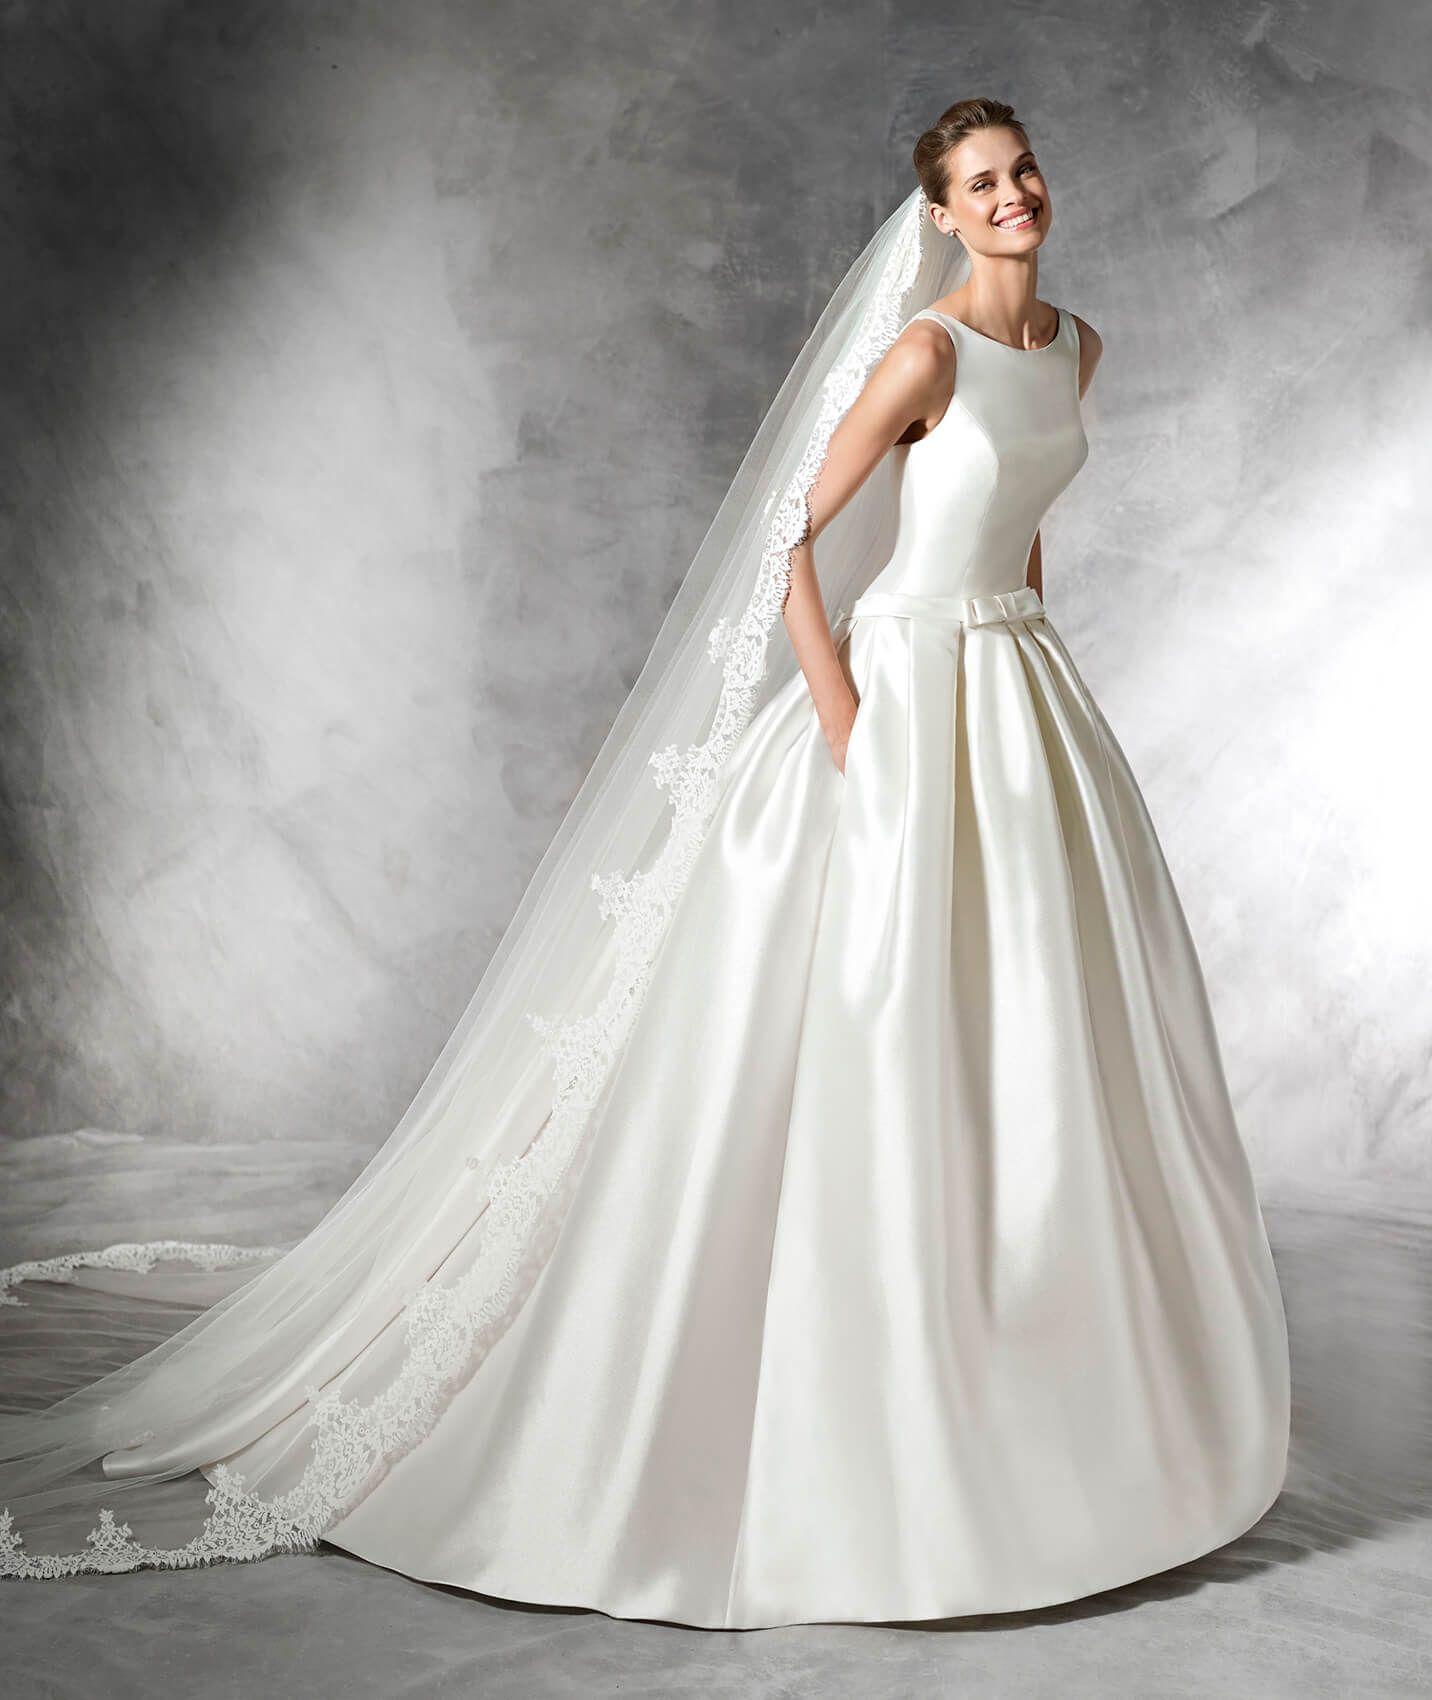 Elegant princess style wedding dress. A classically inspired dress ...